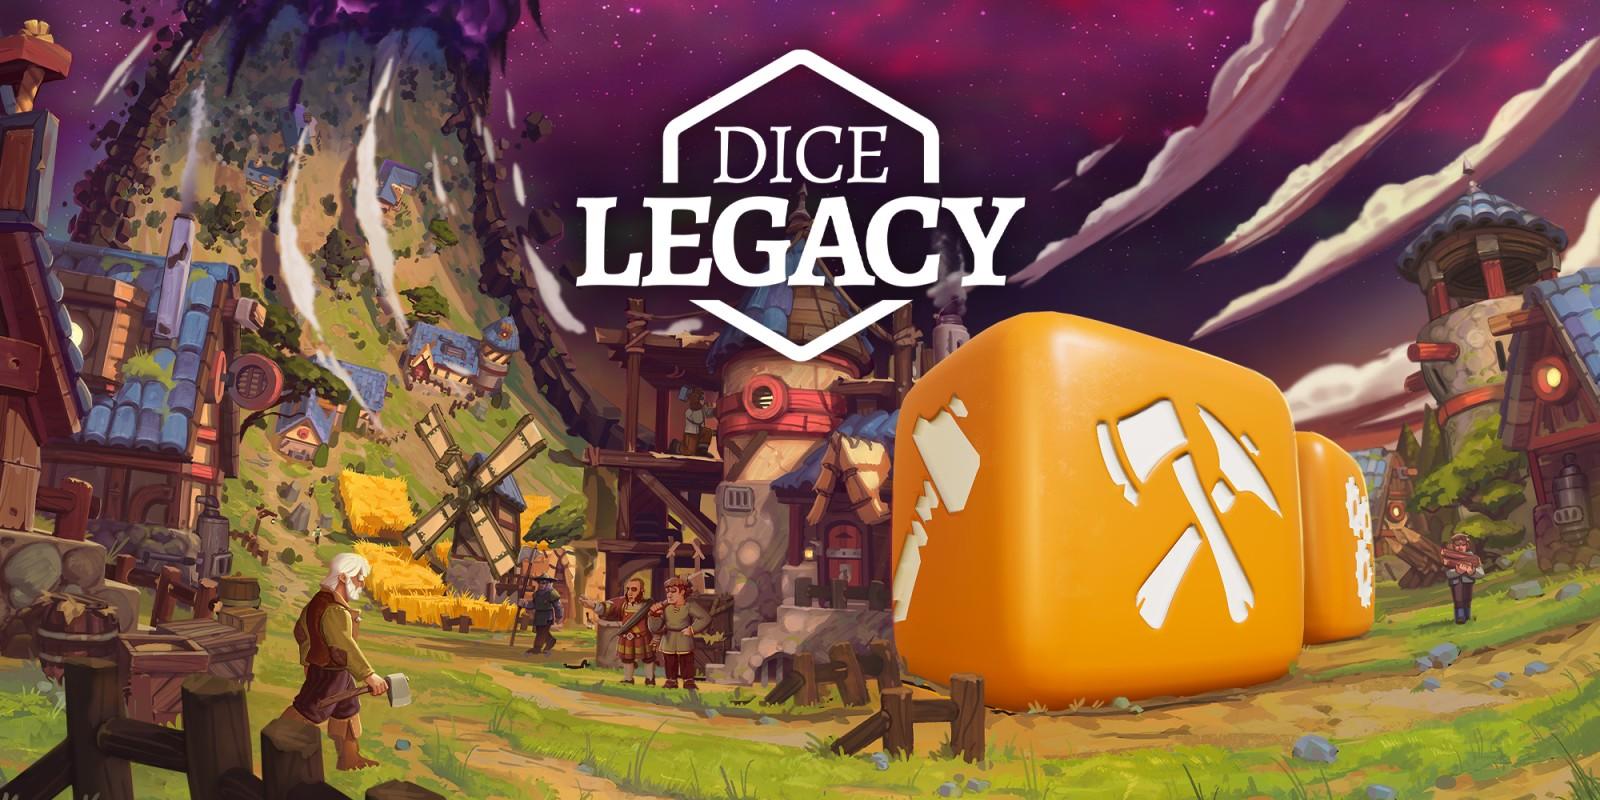 Dice Legacy